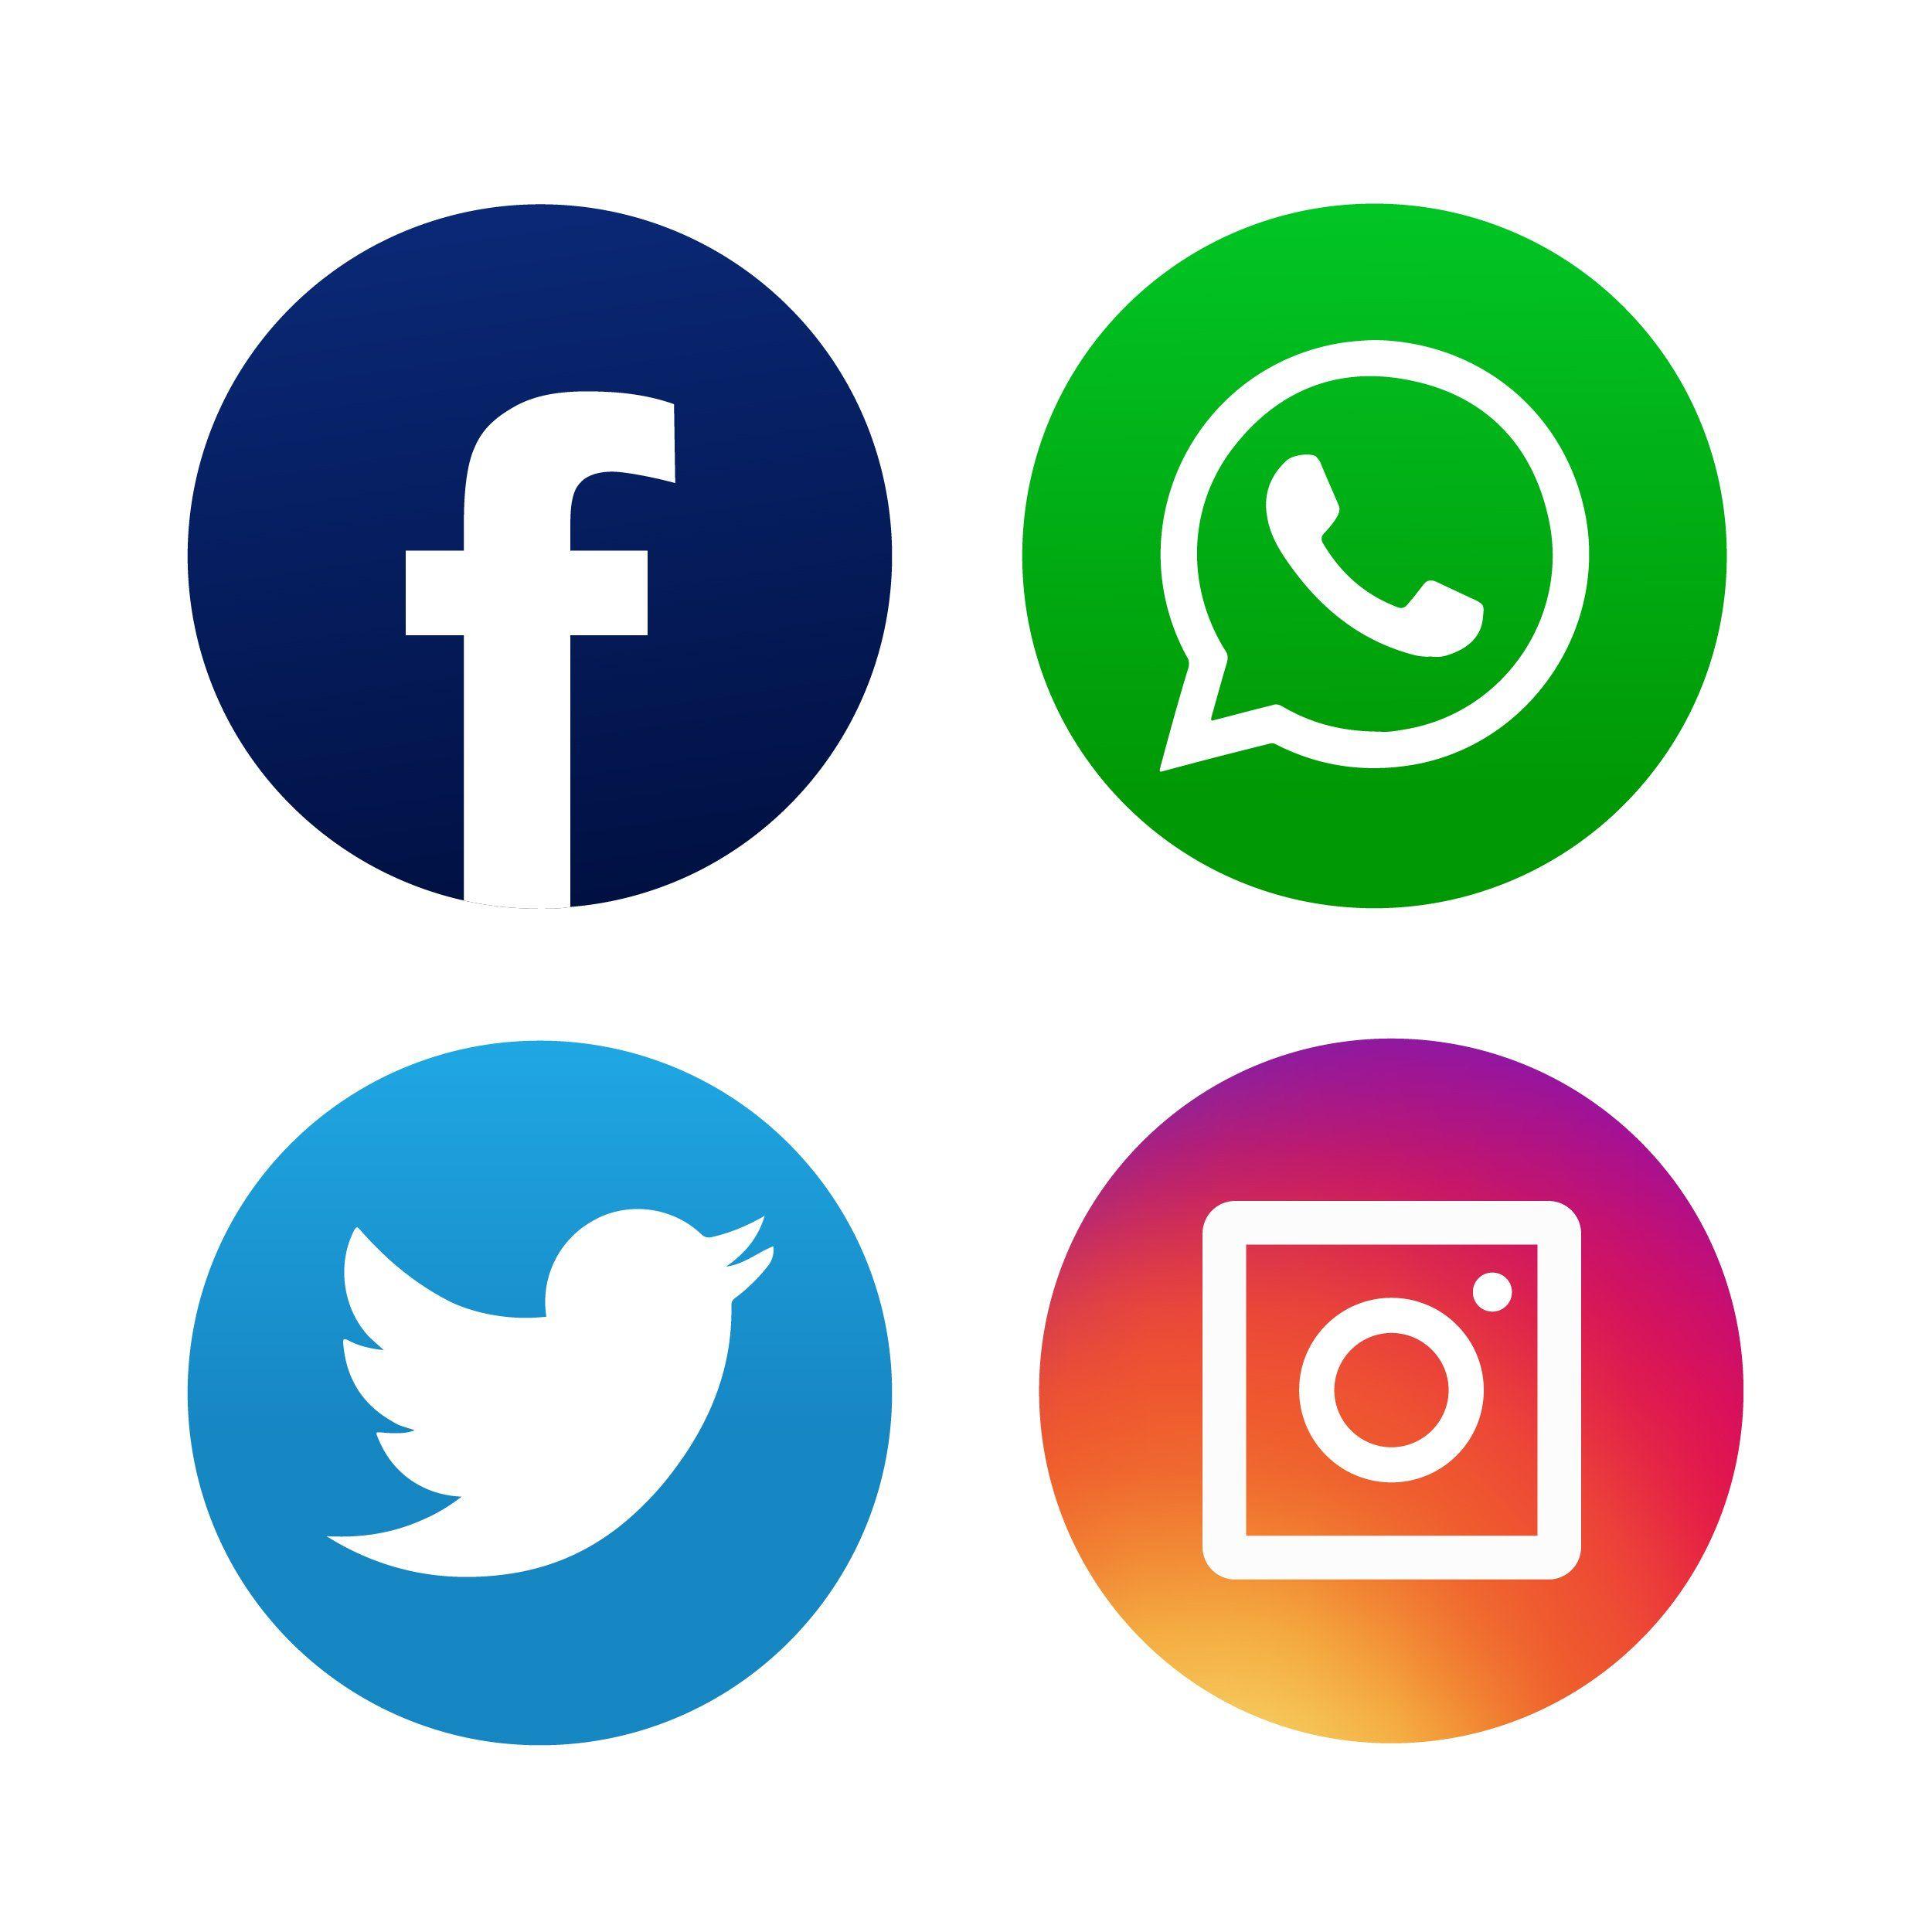 Facebook Twitter And Instagram Logo Facebook And Instagram Logo Logo Facebook Instagram Logo